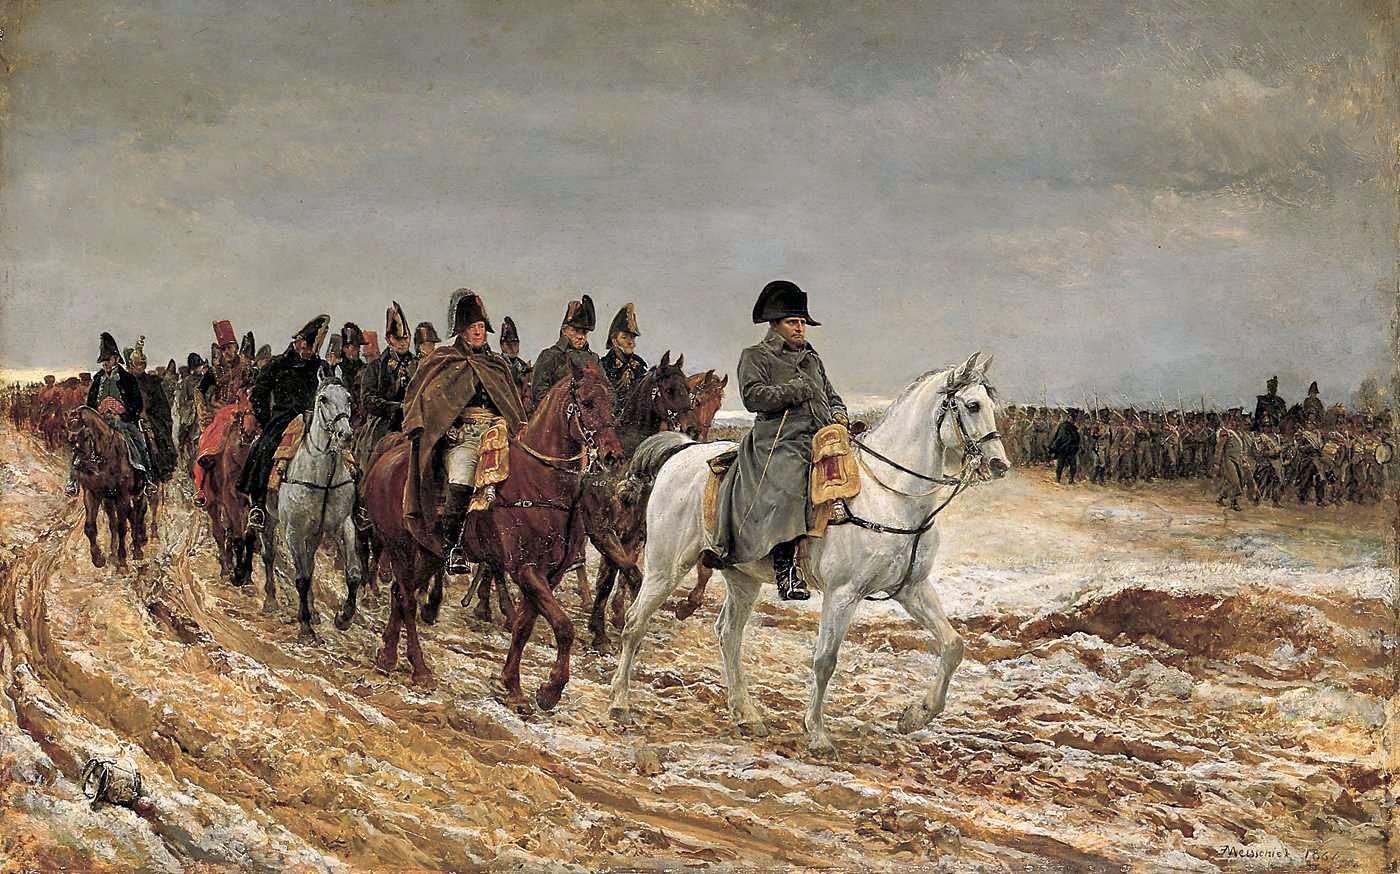 [Image: Meissonier_-_1814%2C_Campagne_de_France.jpg]